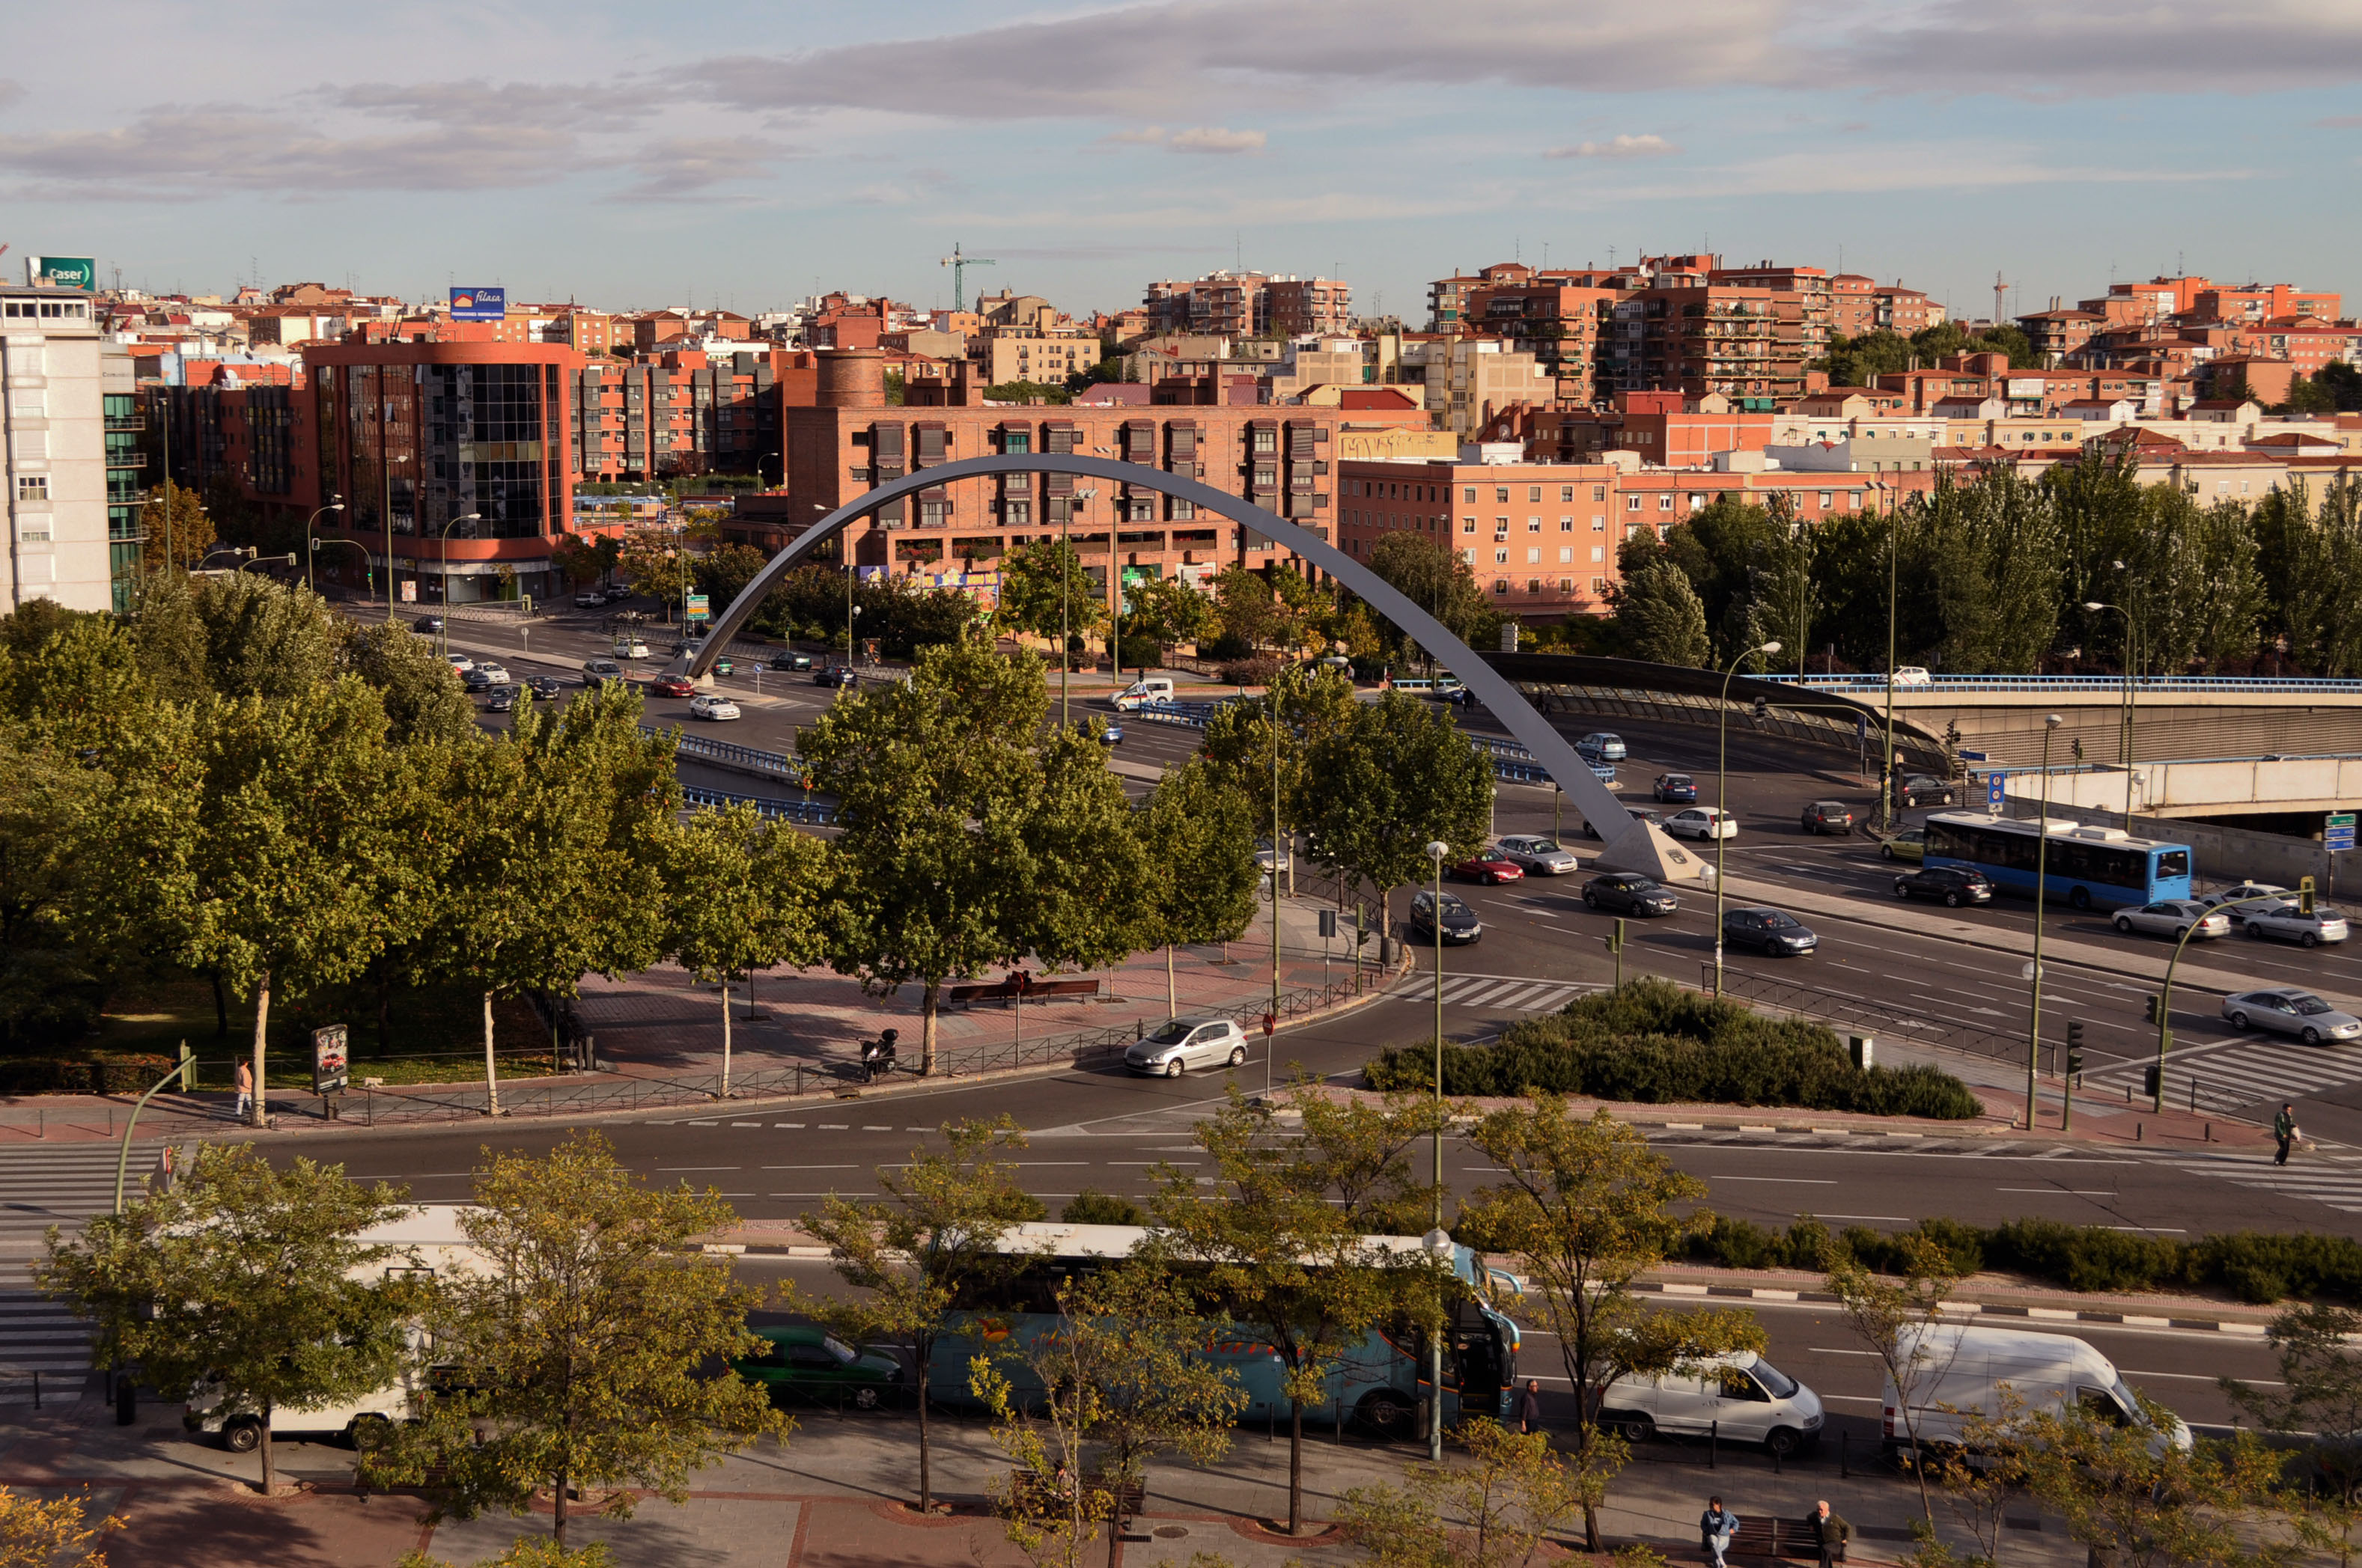 madrid-plaza-de-toros-junction